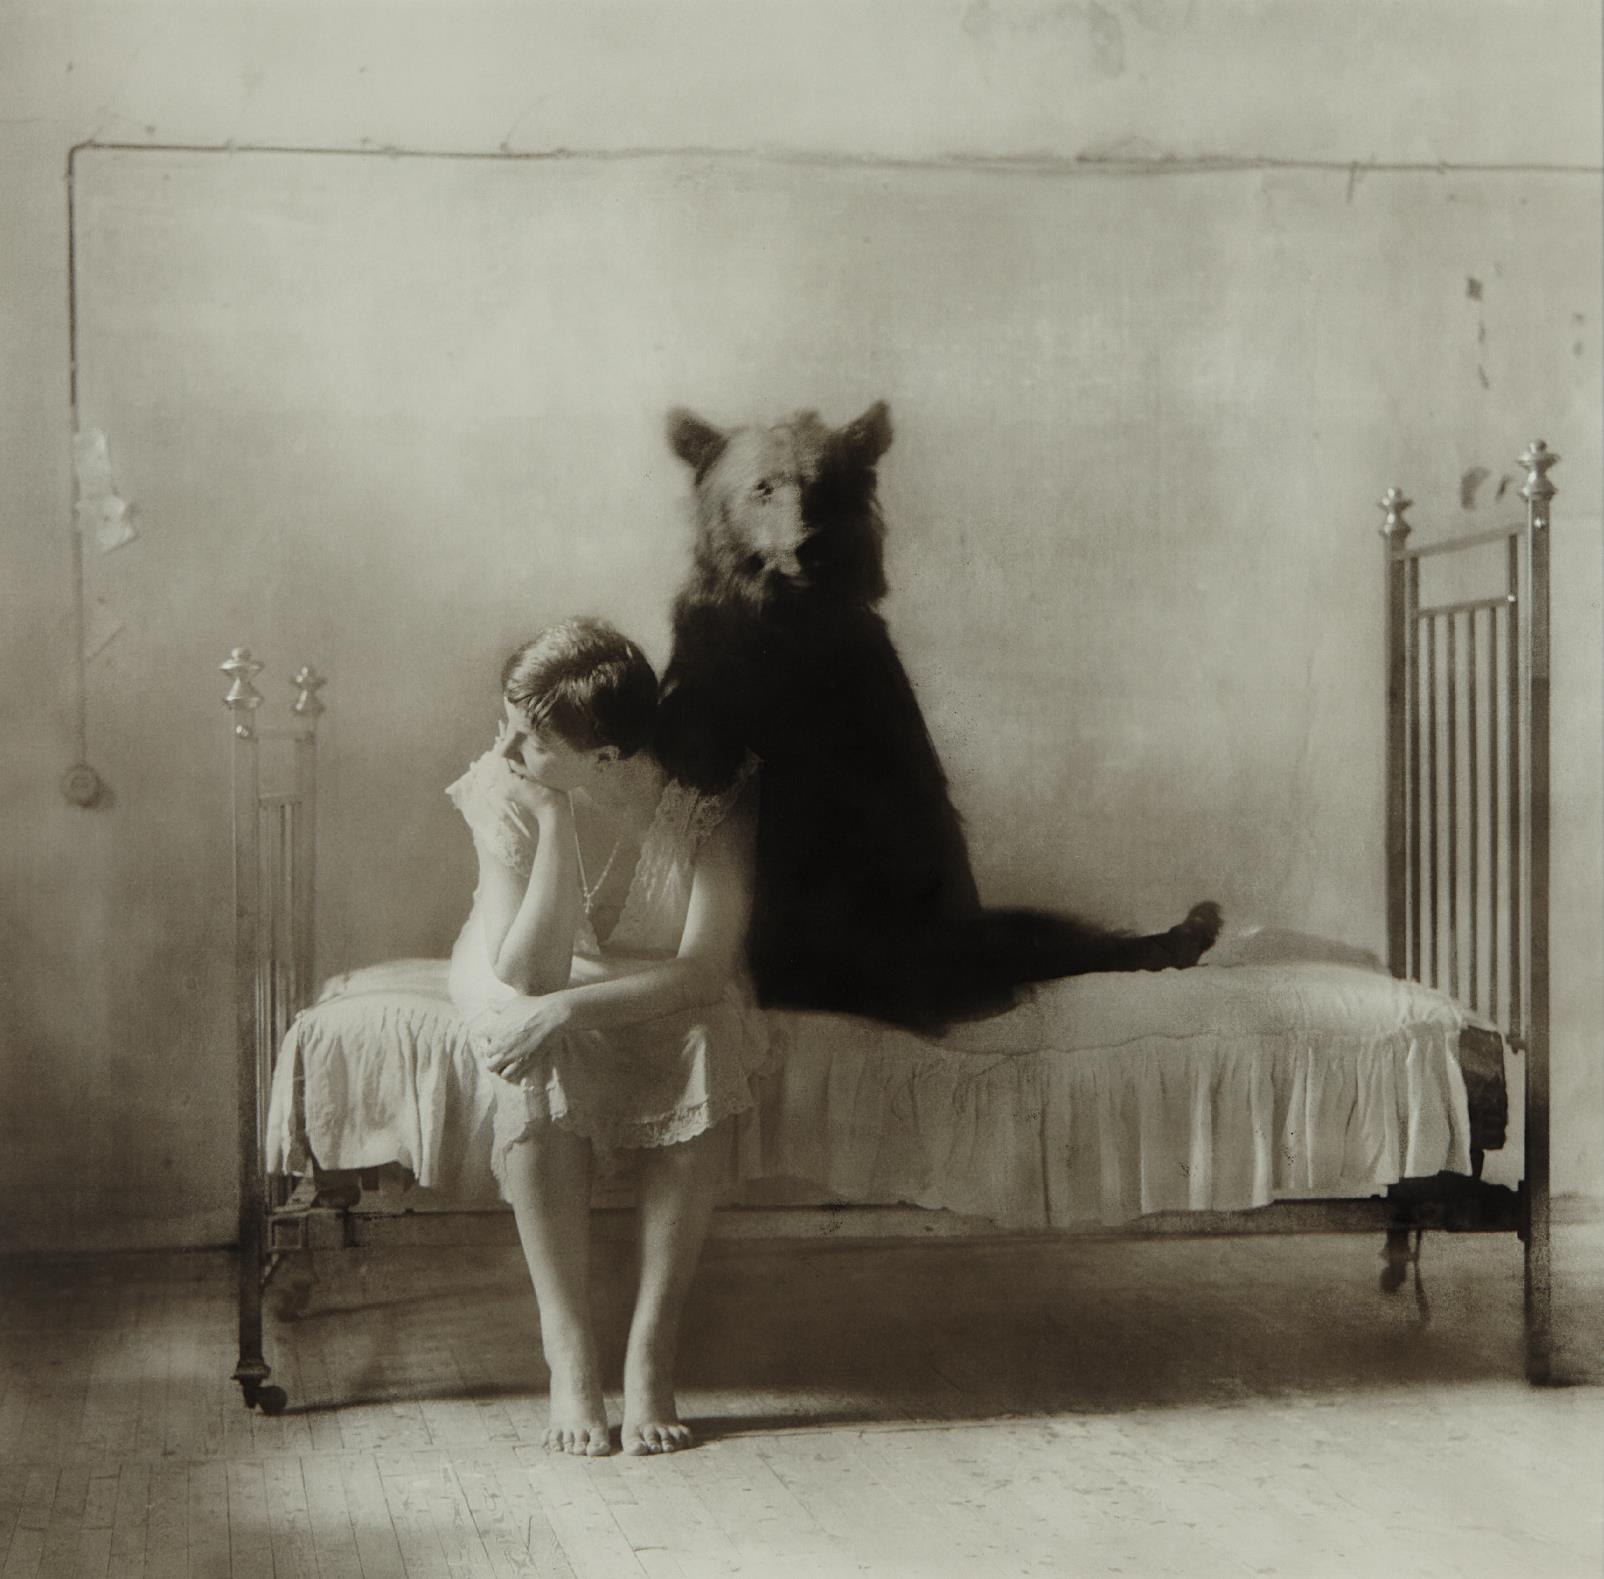 Gregori Maiofis-Adversity Makes Strange Bedfellows-2005